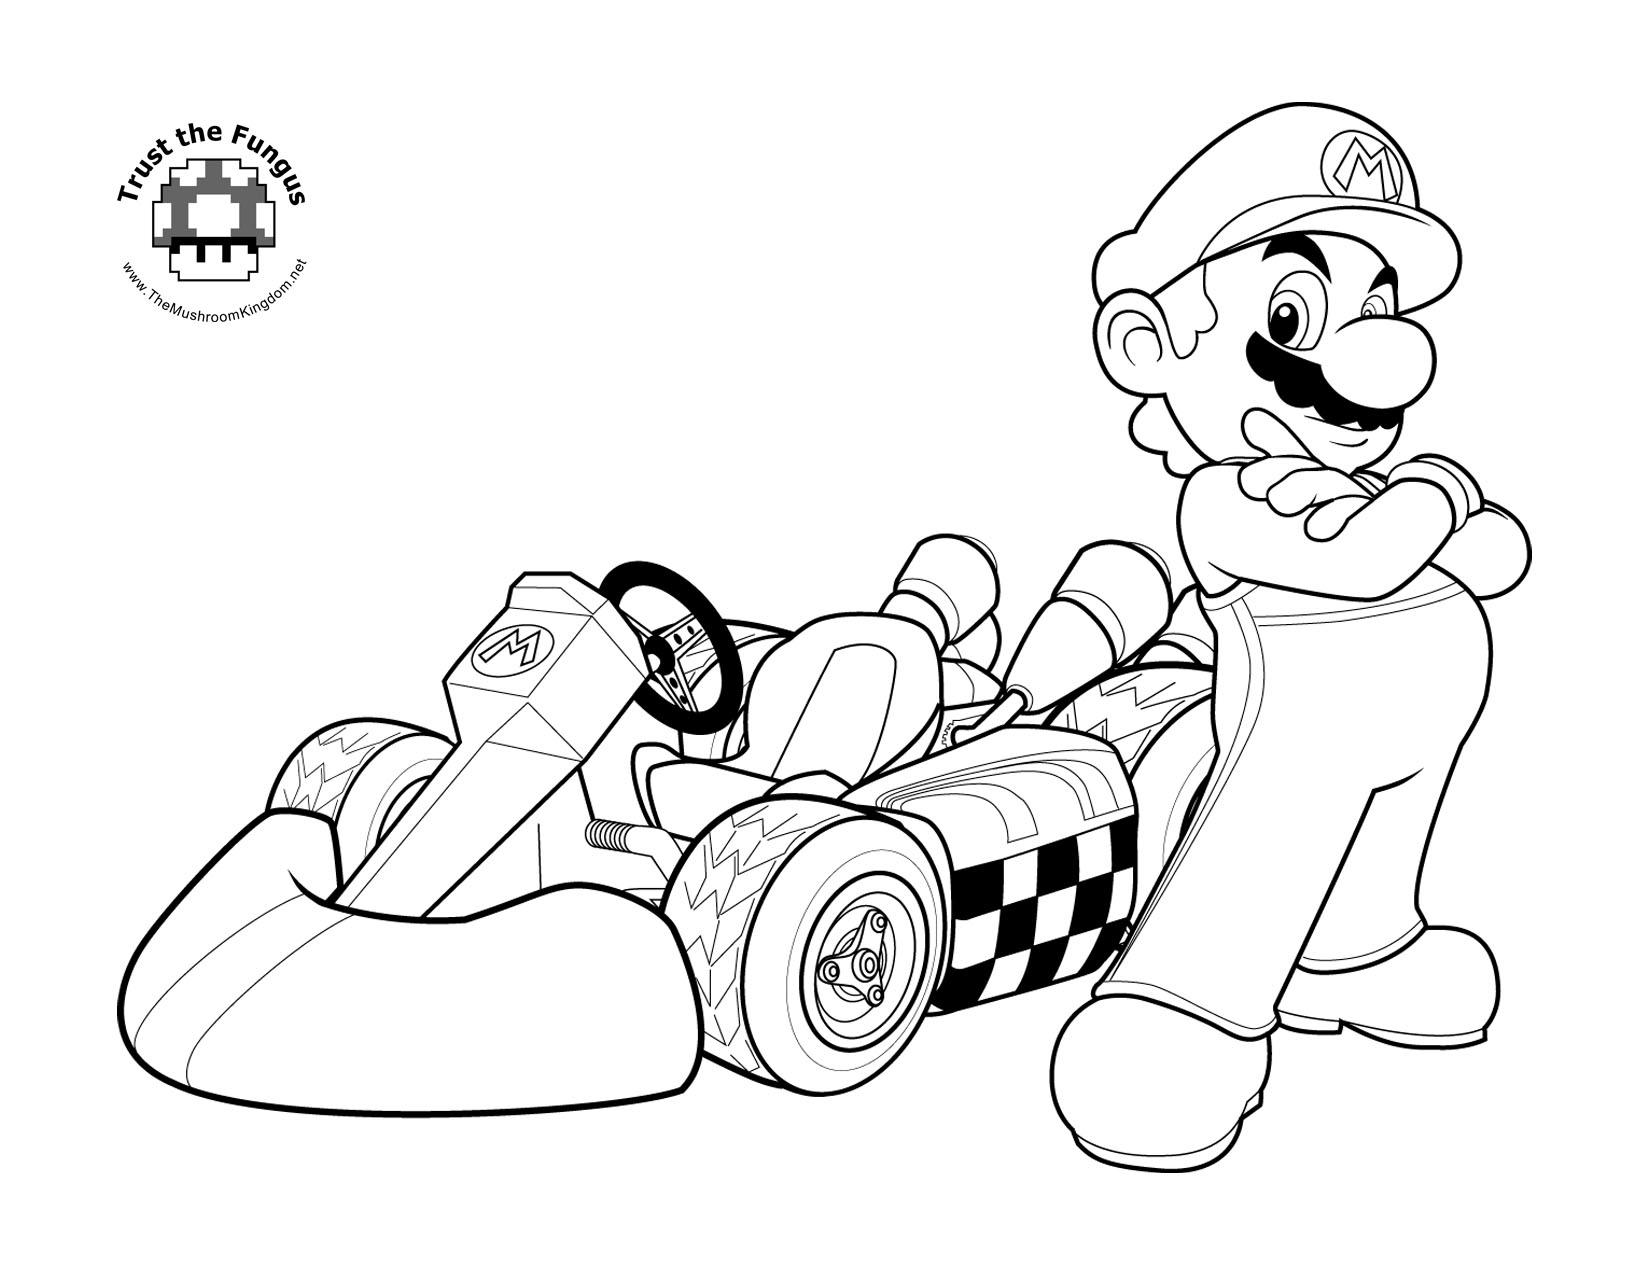 coloring pages mario kart mario kart coloring pages best coloring pages for kids coloring mario kart pages